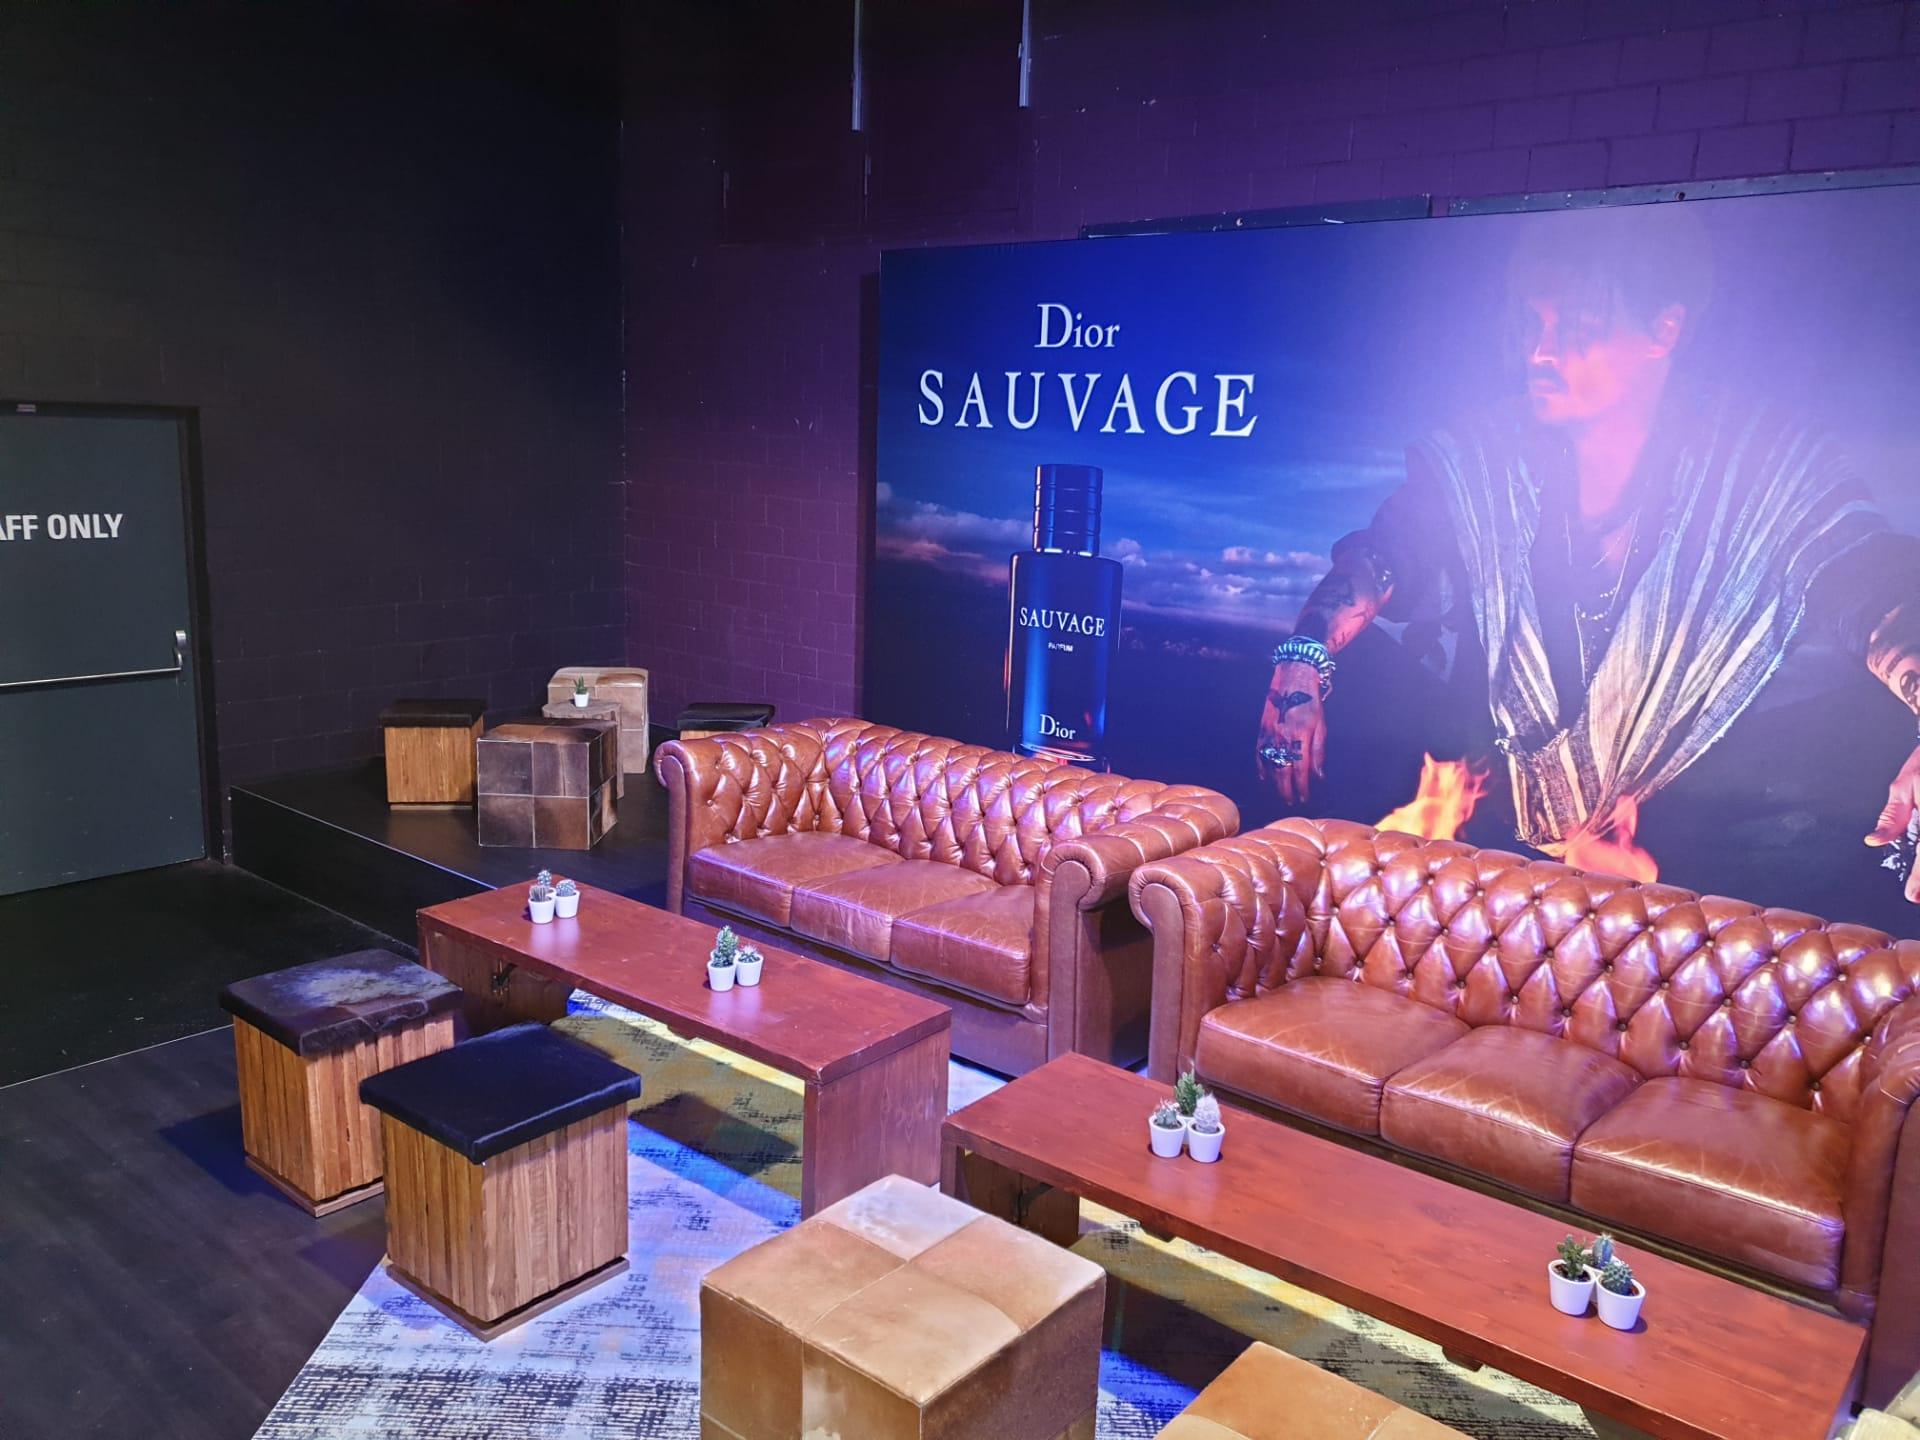 chesterfield english 3er sofa mieten rent-a-lounge 6